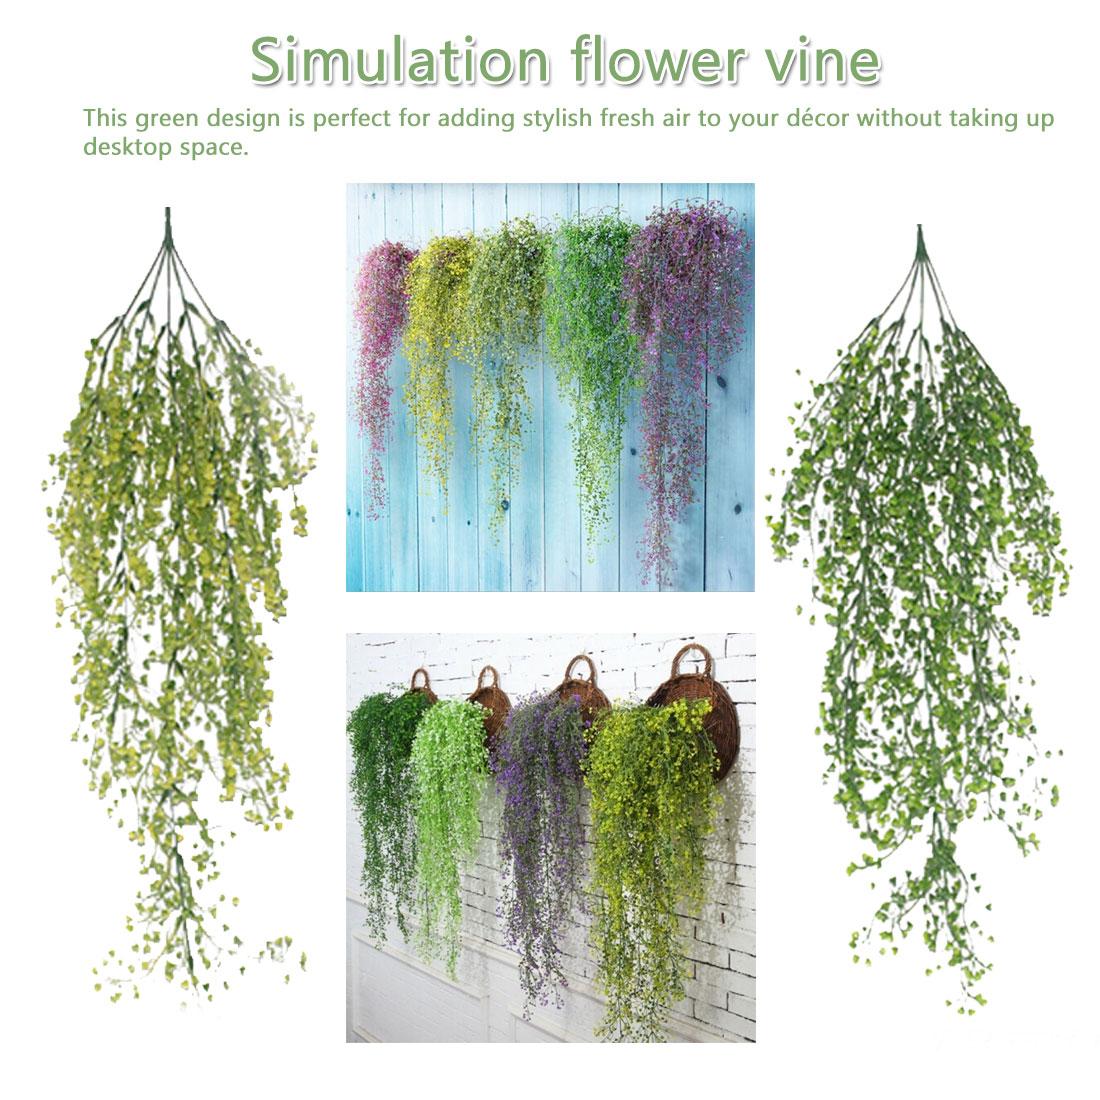 New 85cm Artificial Flowers Simulation Vine Hanging Garland Plant Green Leaves Wedding Home Garden Decoration